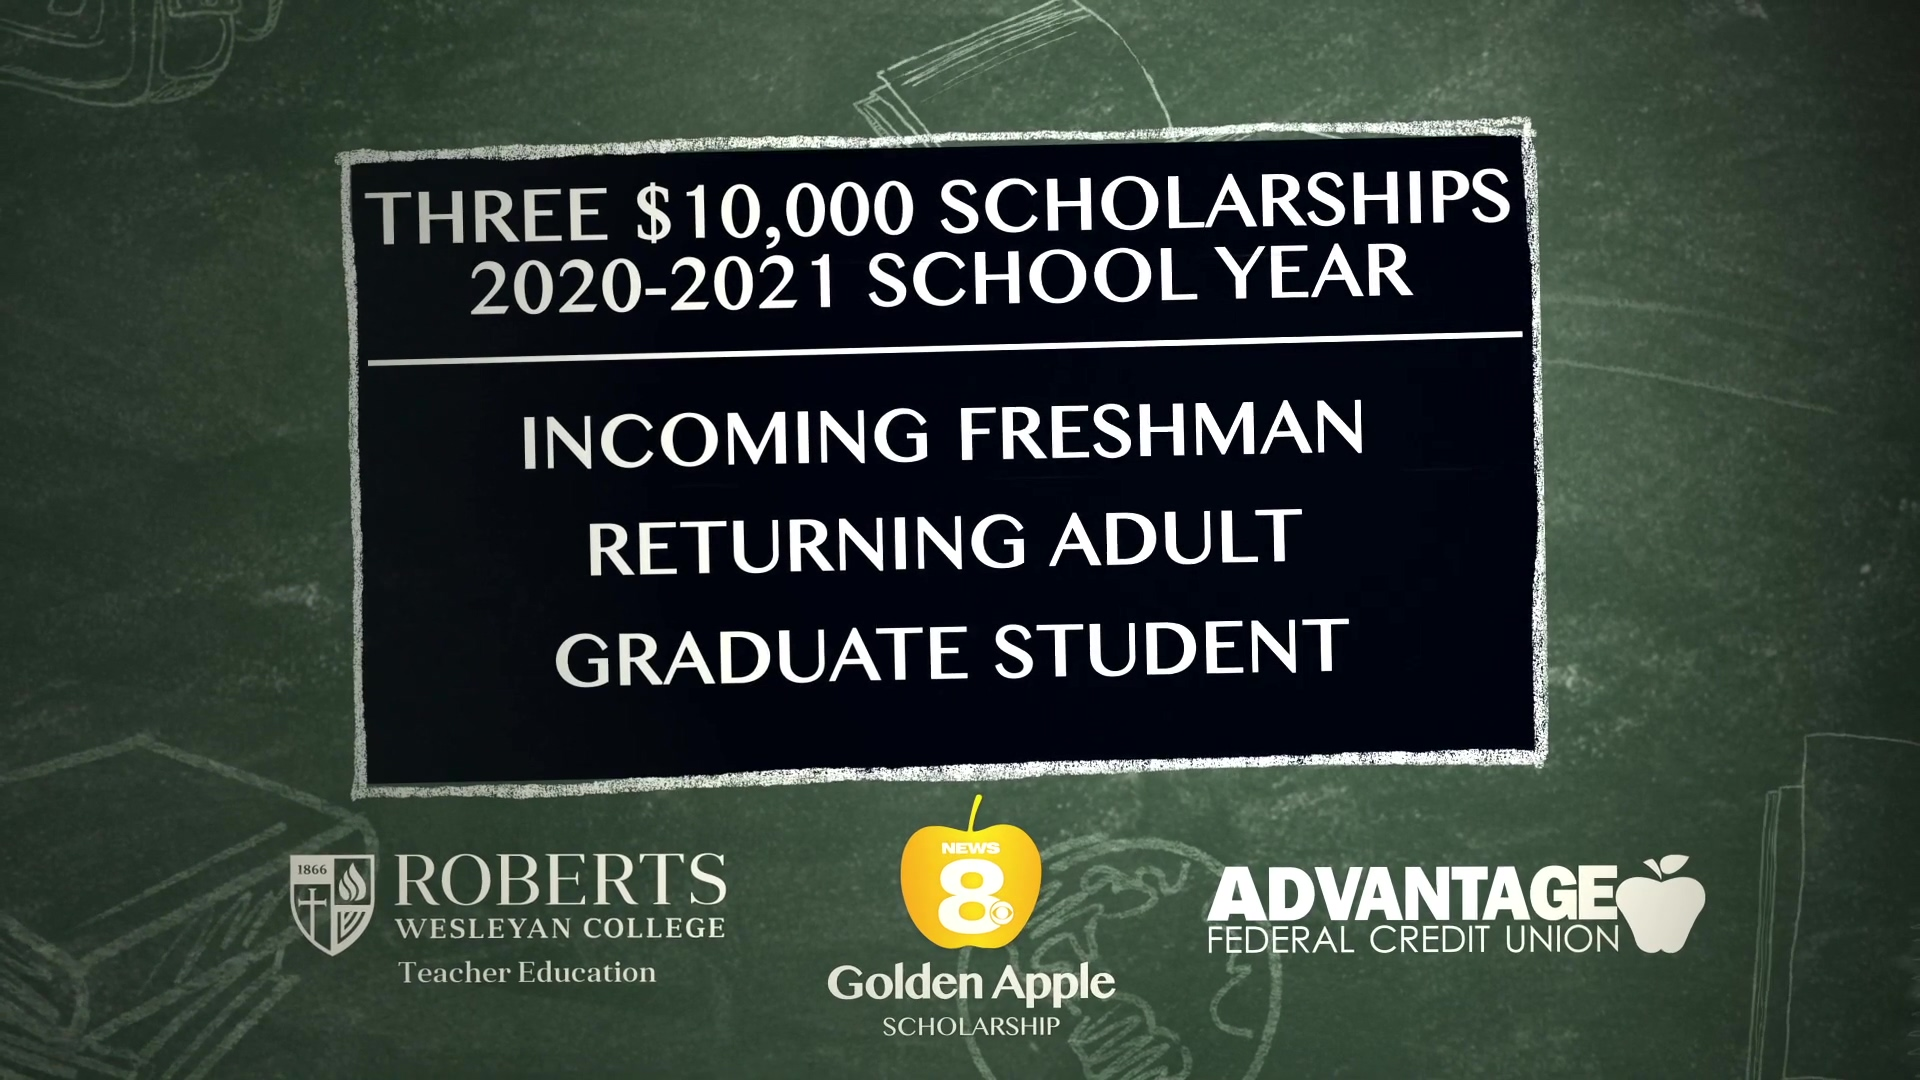 2020-21_VIDEO_61230_isci_3000_GoldenApple-Scholarship-2020-ApplyNow